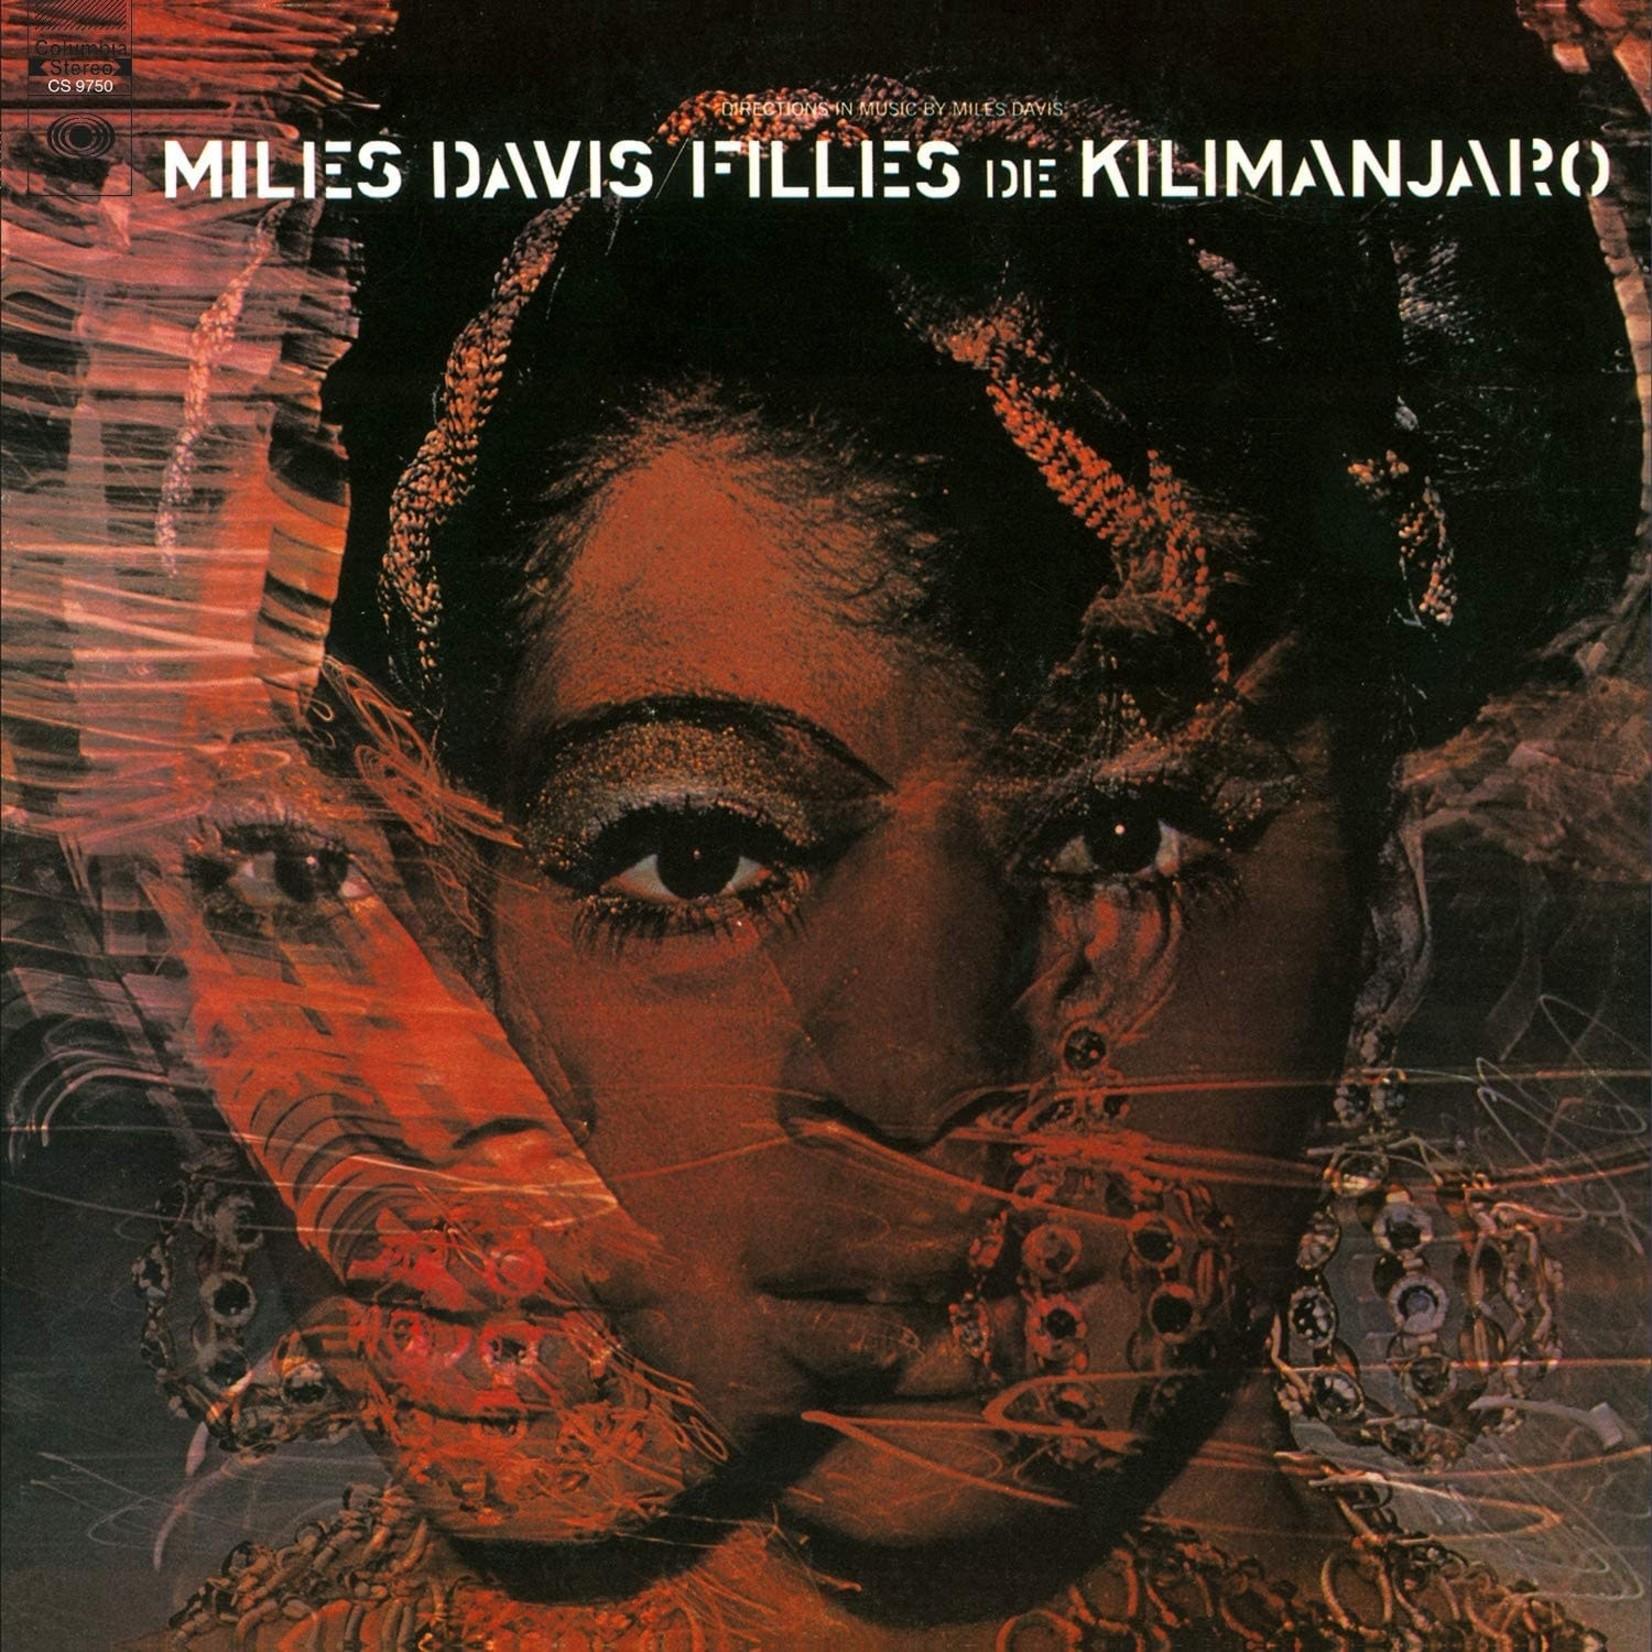 MILES DAVIS FILLES DE KILIMANJARO/FEATURING WAYNE SHORTER, HERBIE HANCOCK, RON CARTER, TONY WILLIAMS & CHICK COREA)